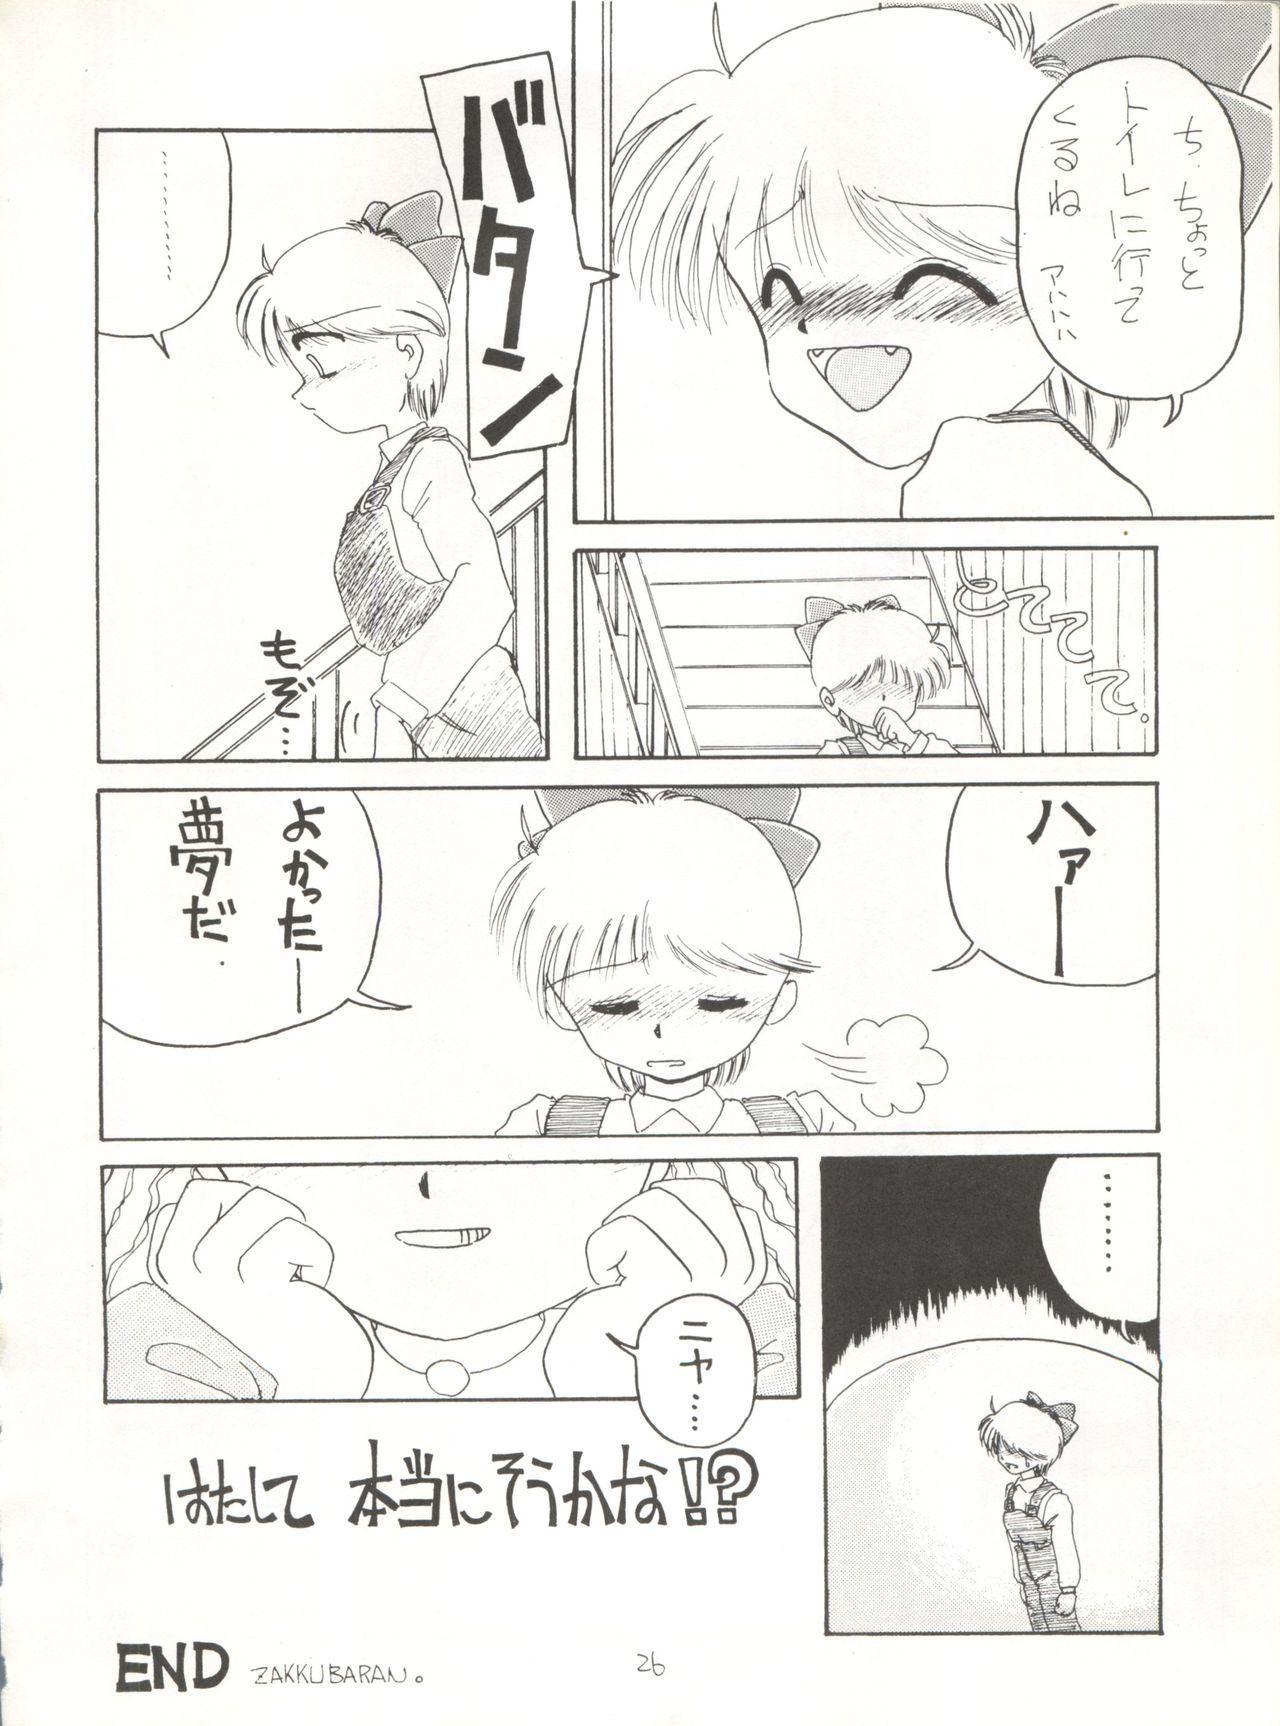 [Global One (MARO)] Sadistic 5 (Cutey Honey, Devilman, Sailor Moon), [Global One (MARO)] Sadistic (Dirty Pair, Fushigi no Umi no Nadia, Sailor Moon), [Studio Ikkatsumajin] .ribbon (Hime-chan's Ribbon) 149